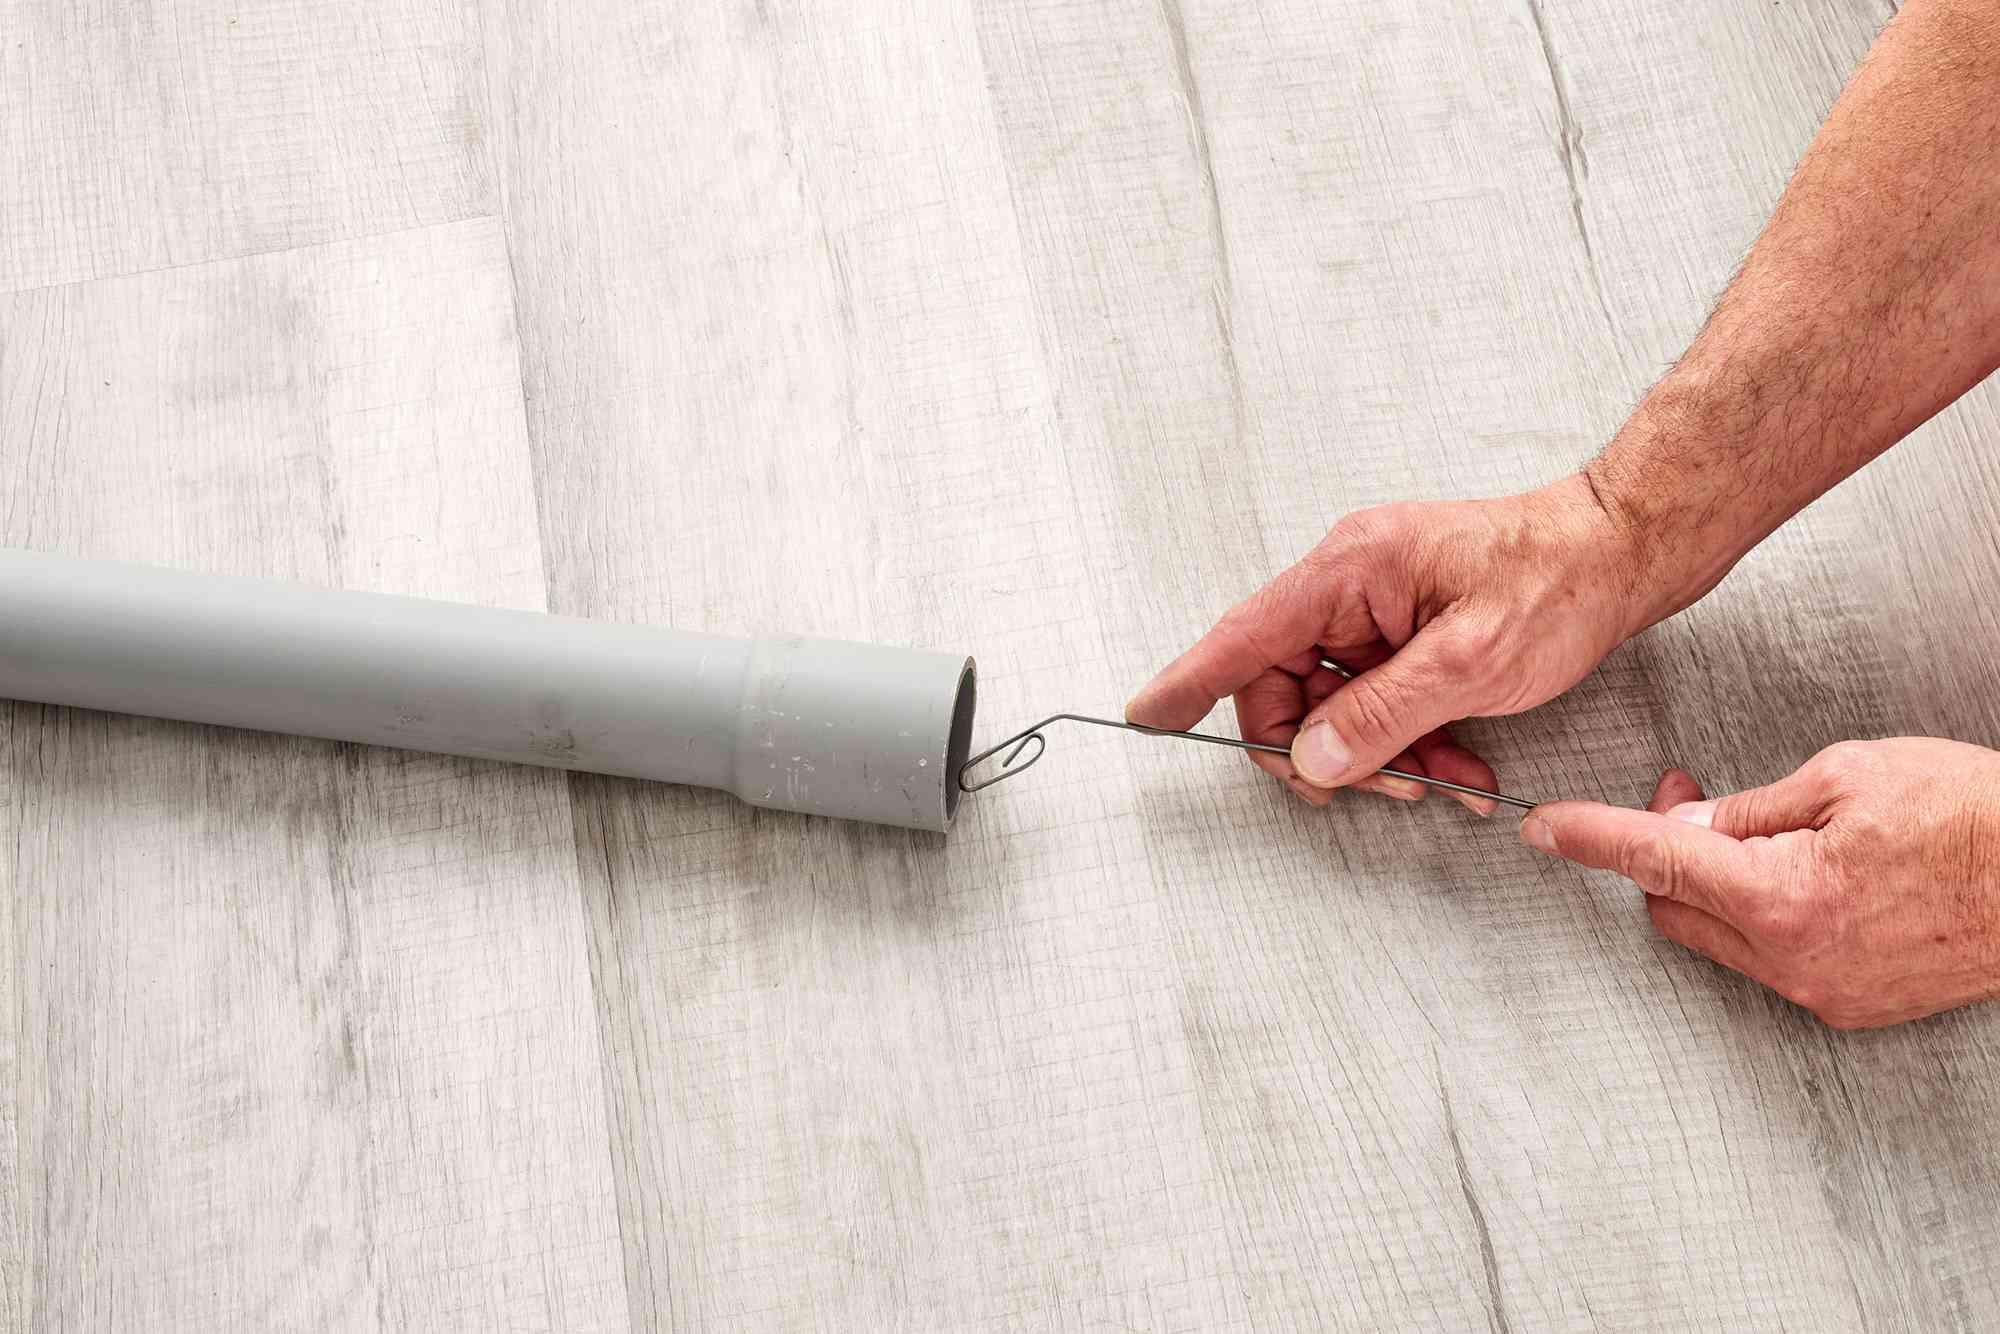 Fish tape end fed through conduit tube